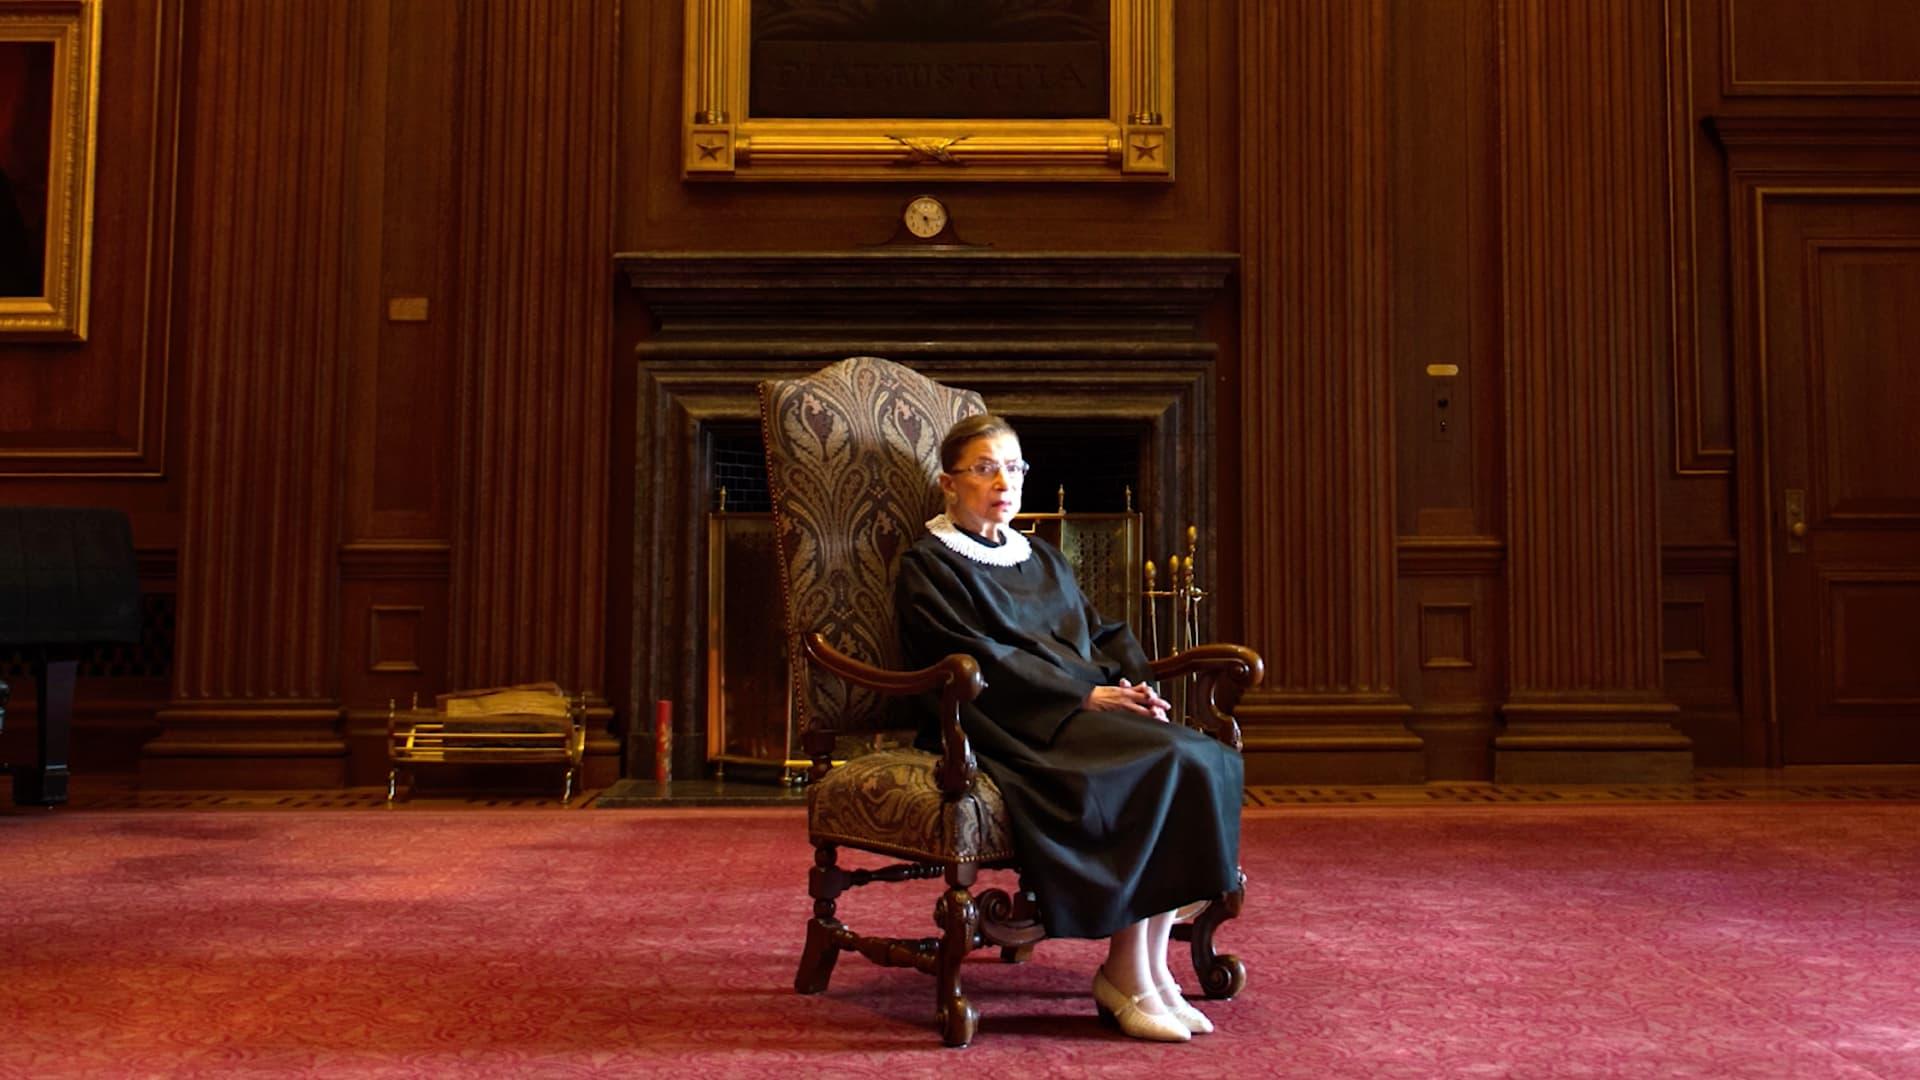 Supreme Court to decide whether Trump can terminate Obama-era DACA program